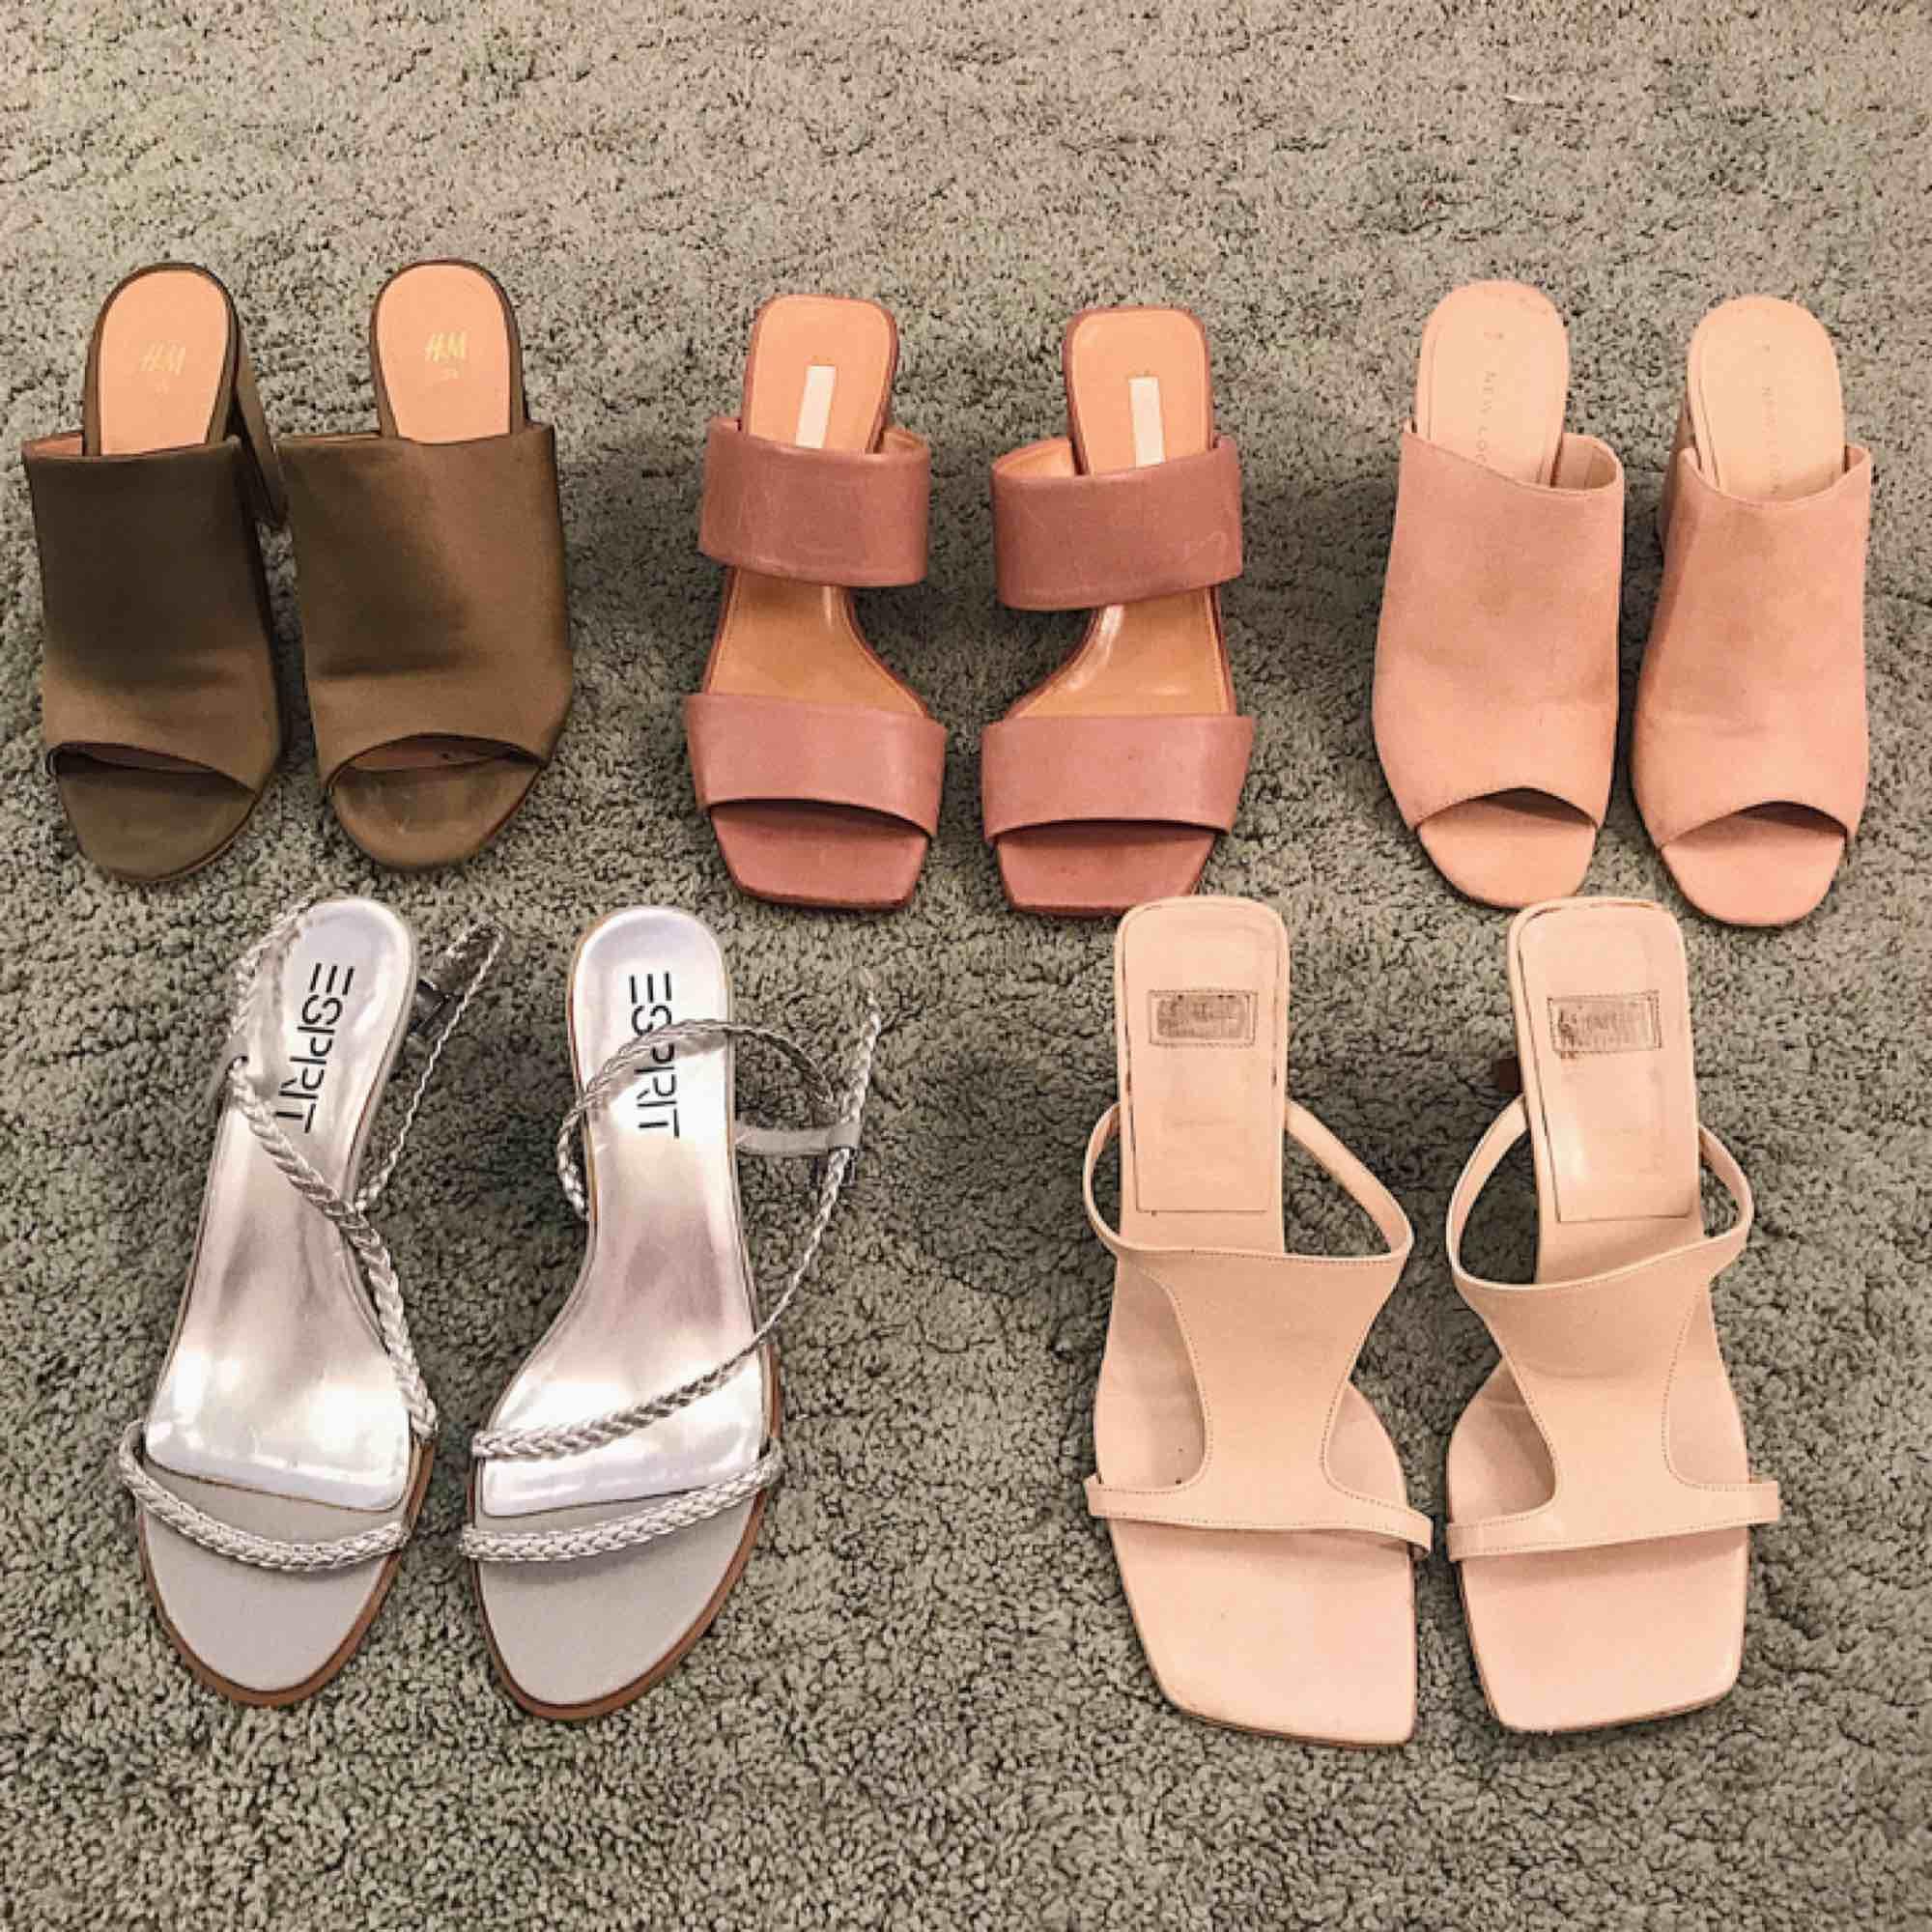 Olika sandaletter från olika märken ✨ Storlek 38/39. 150kr/par 🧚🏼♀️ Frakt 50kr. Skor.